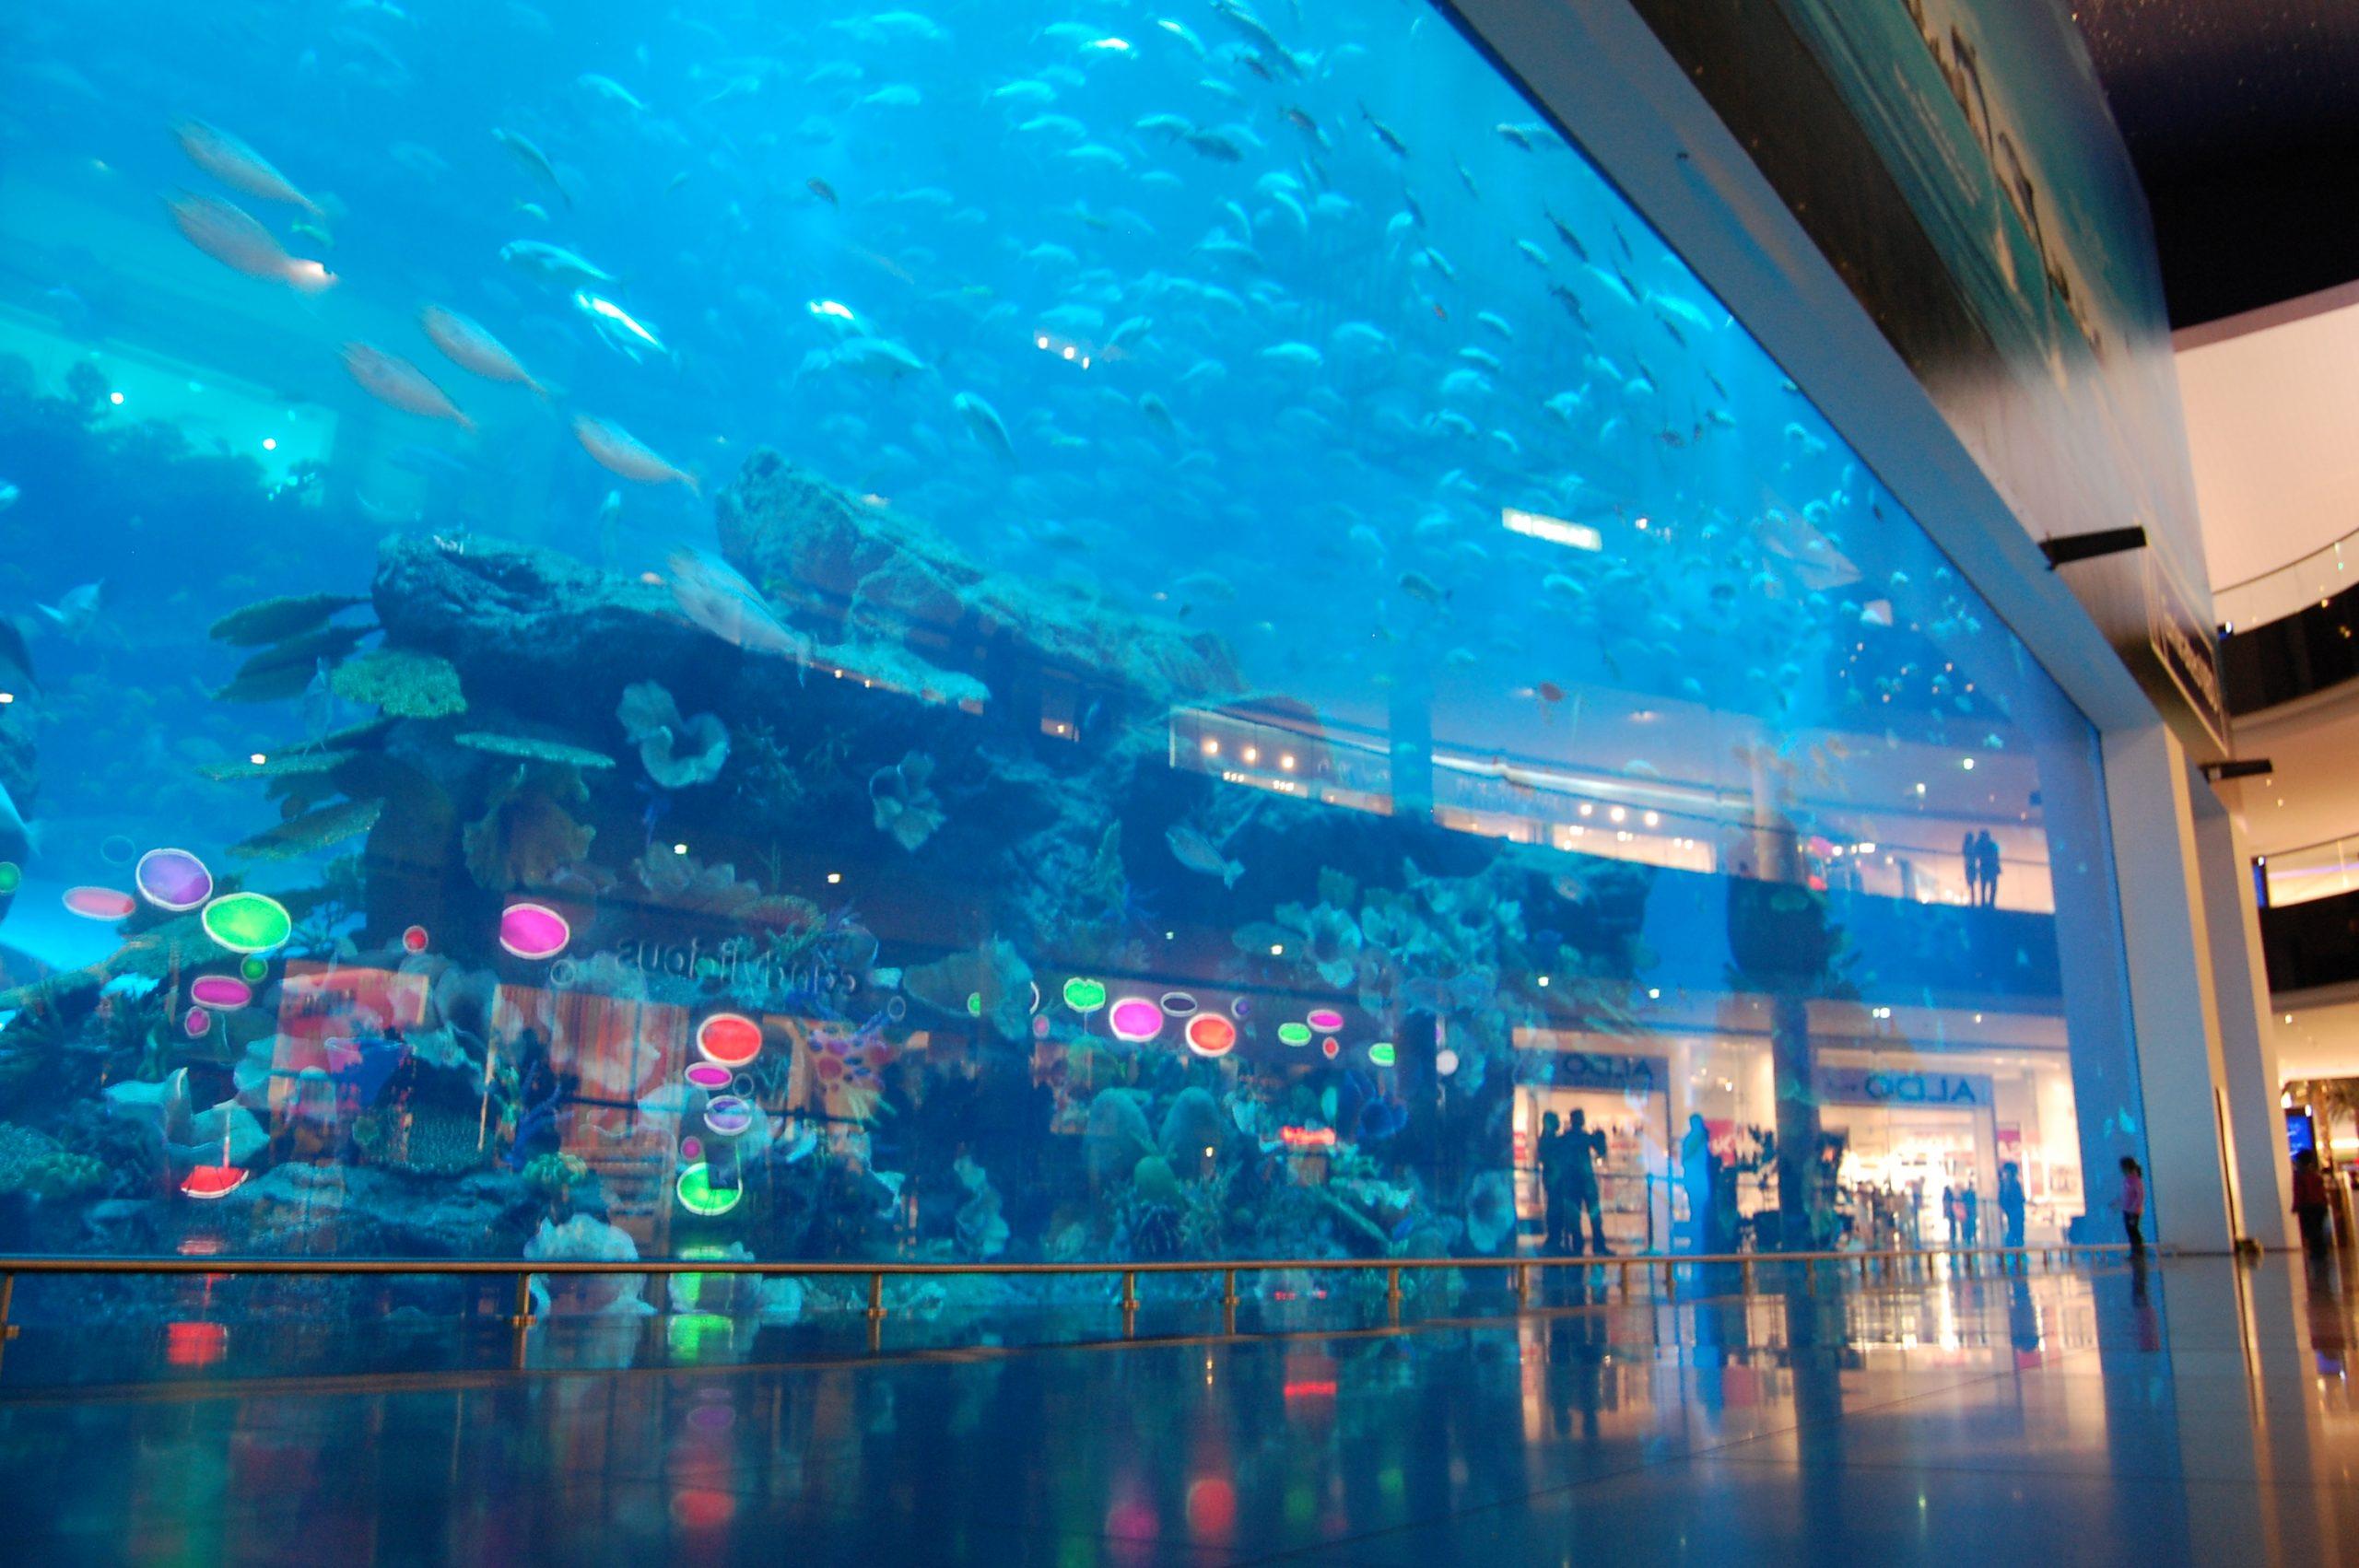 dubai aquarium - إكواريوم دبي (1)